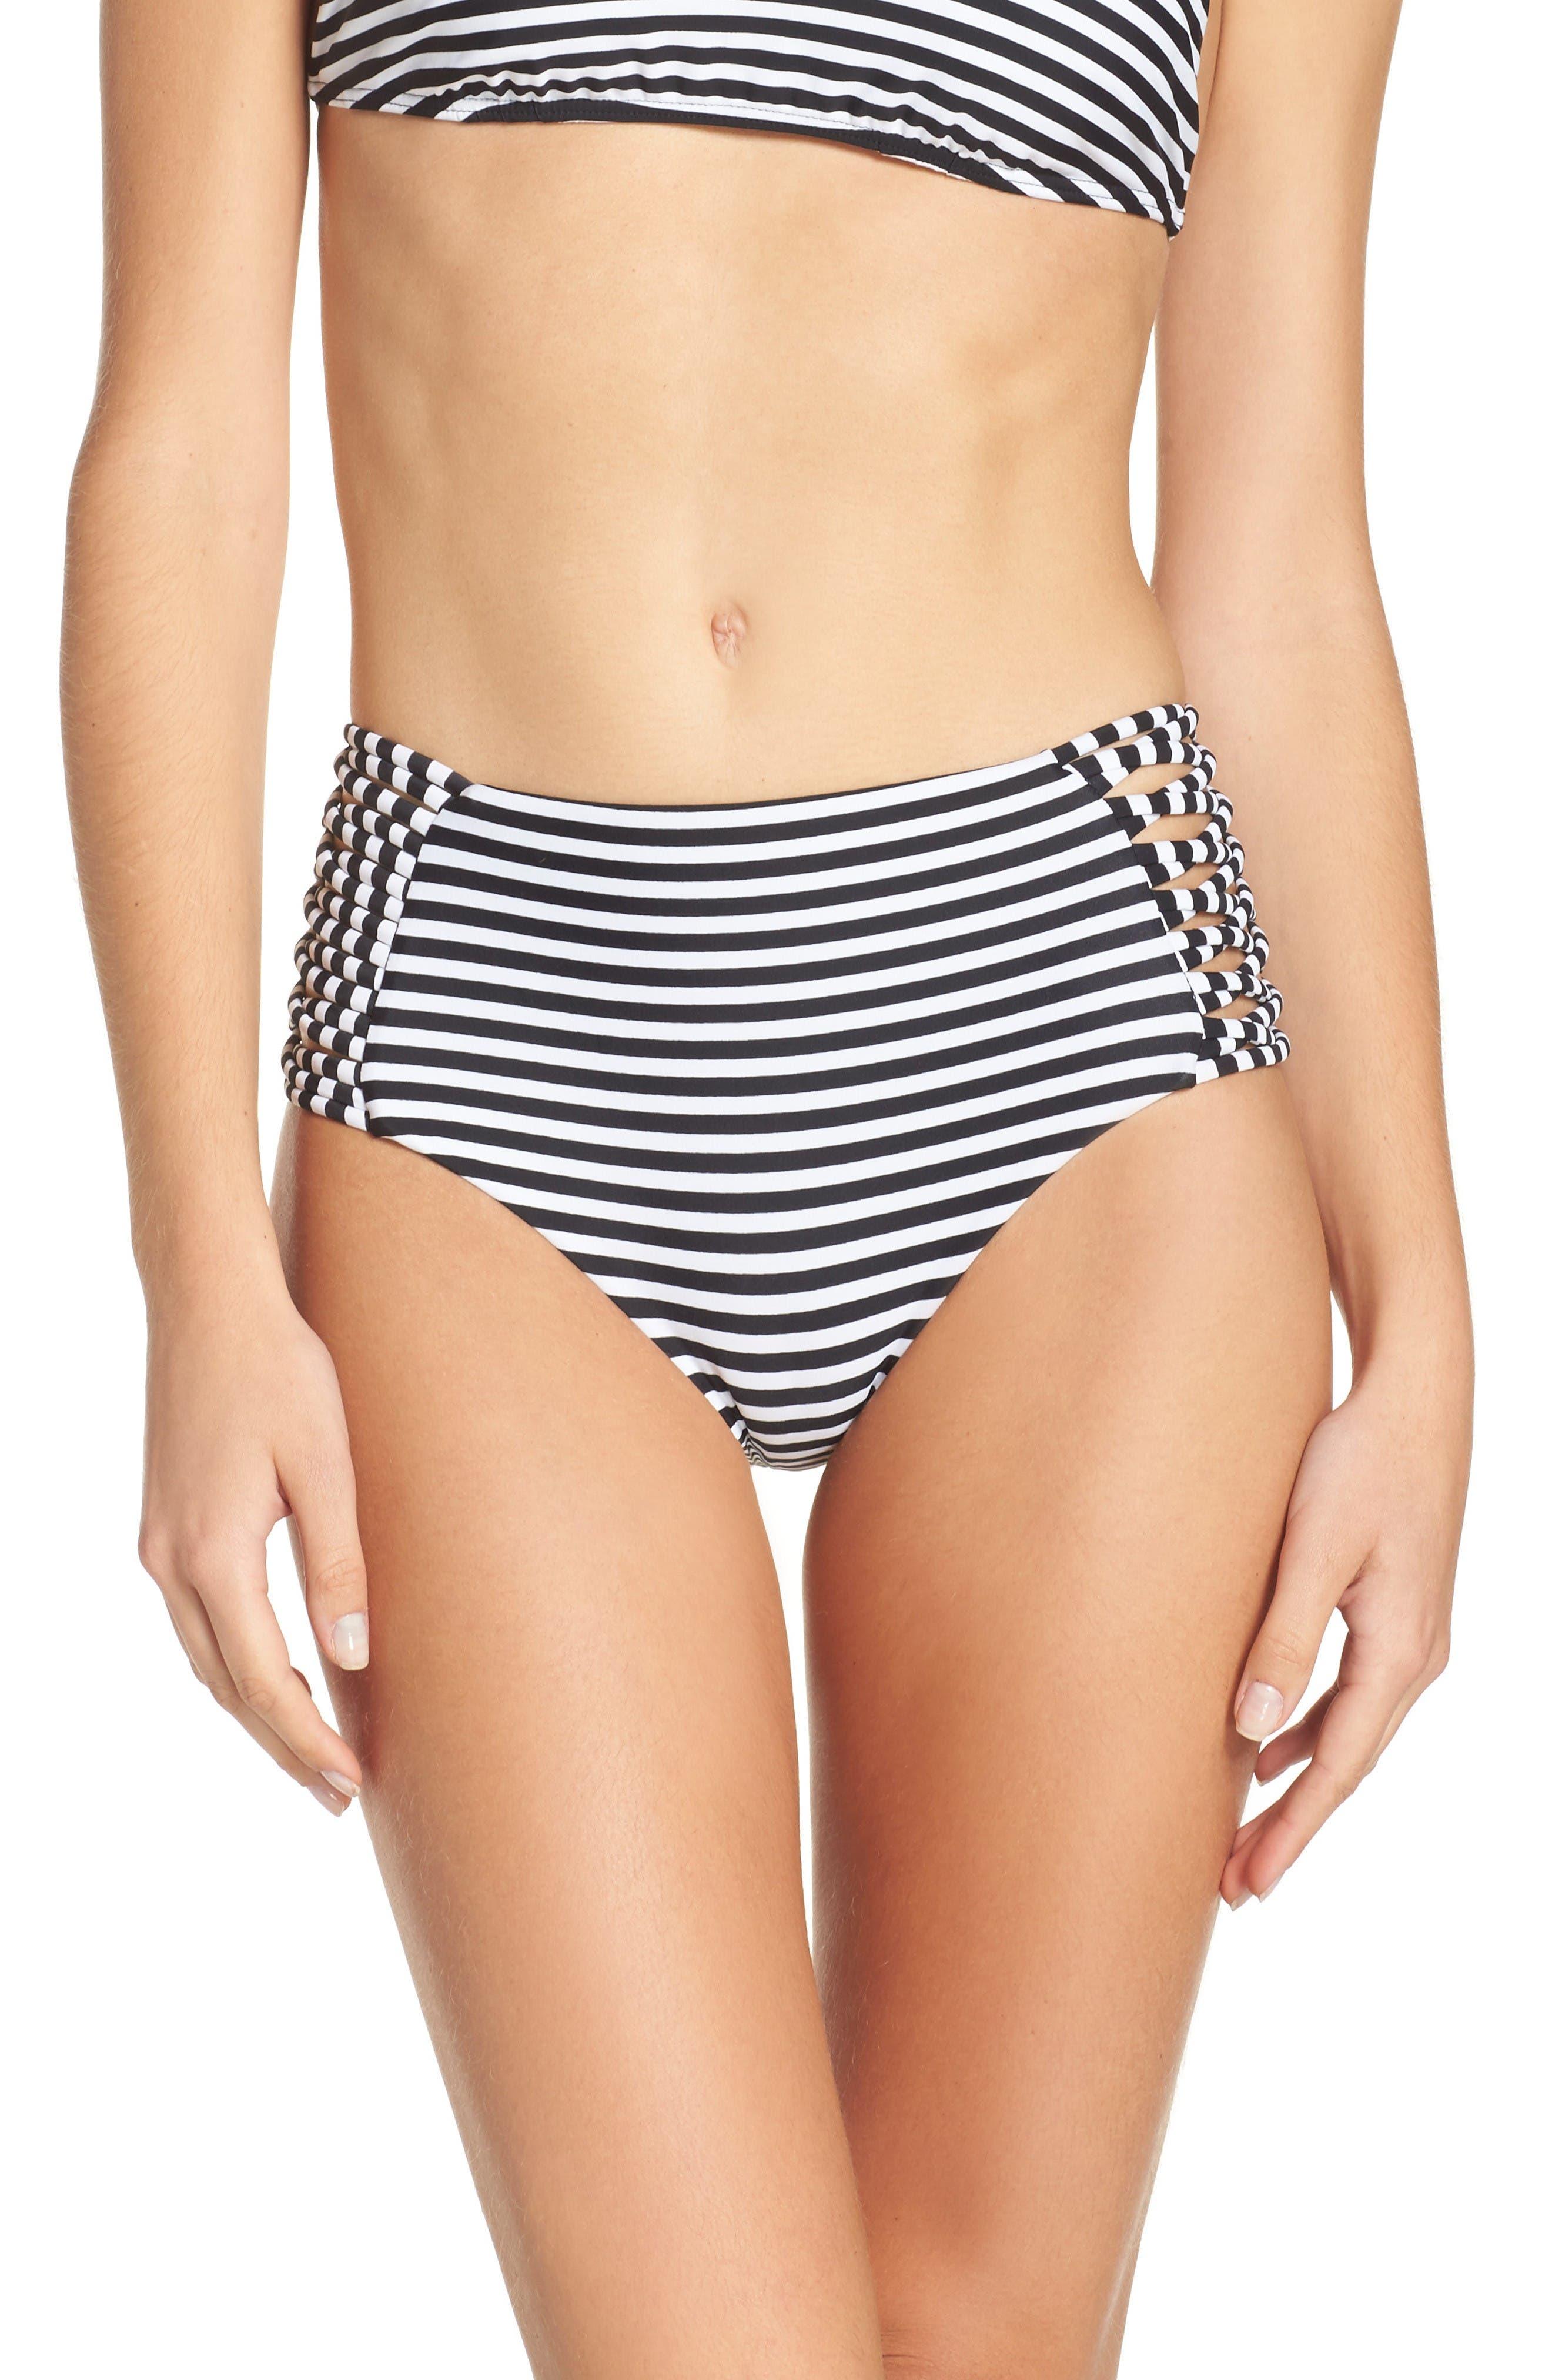 Alternate Image 1 Selected - Byrds of Paradise Morrissey High Waist Bikini Bottoms